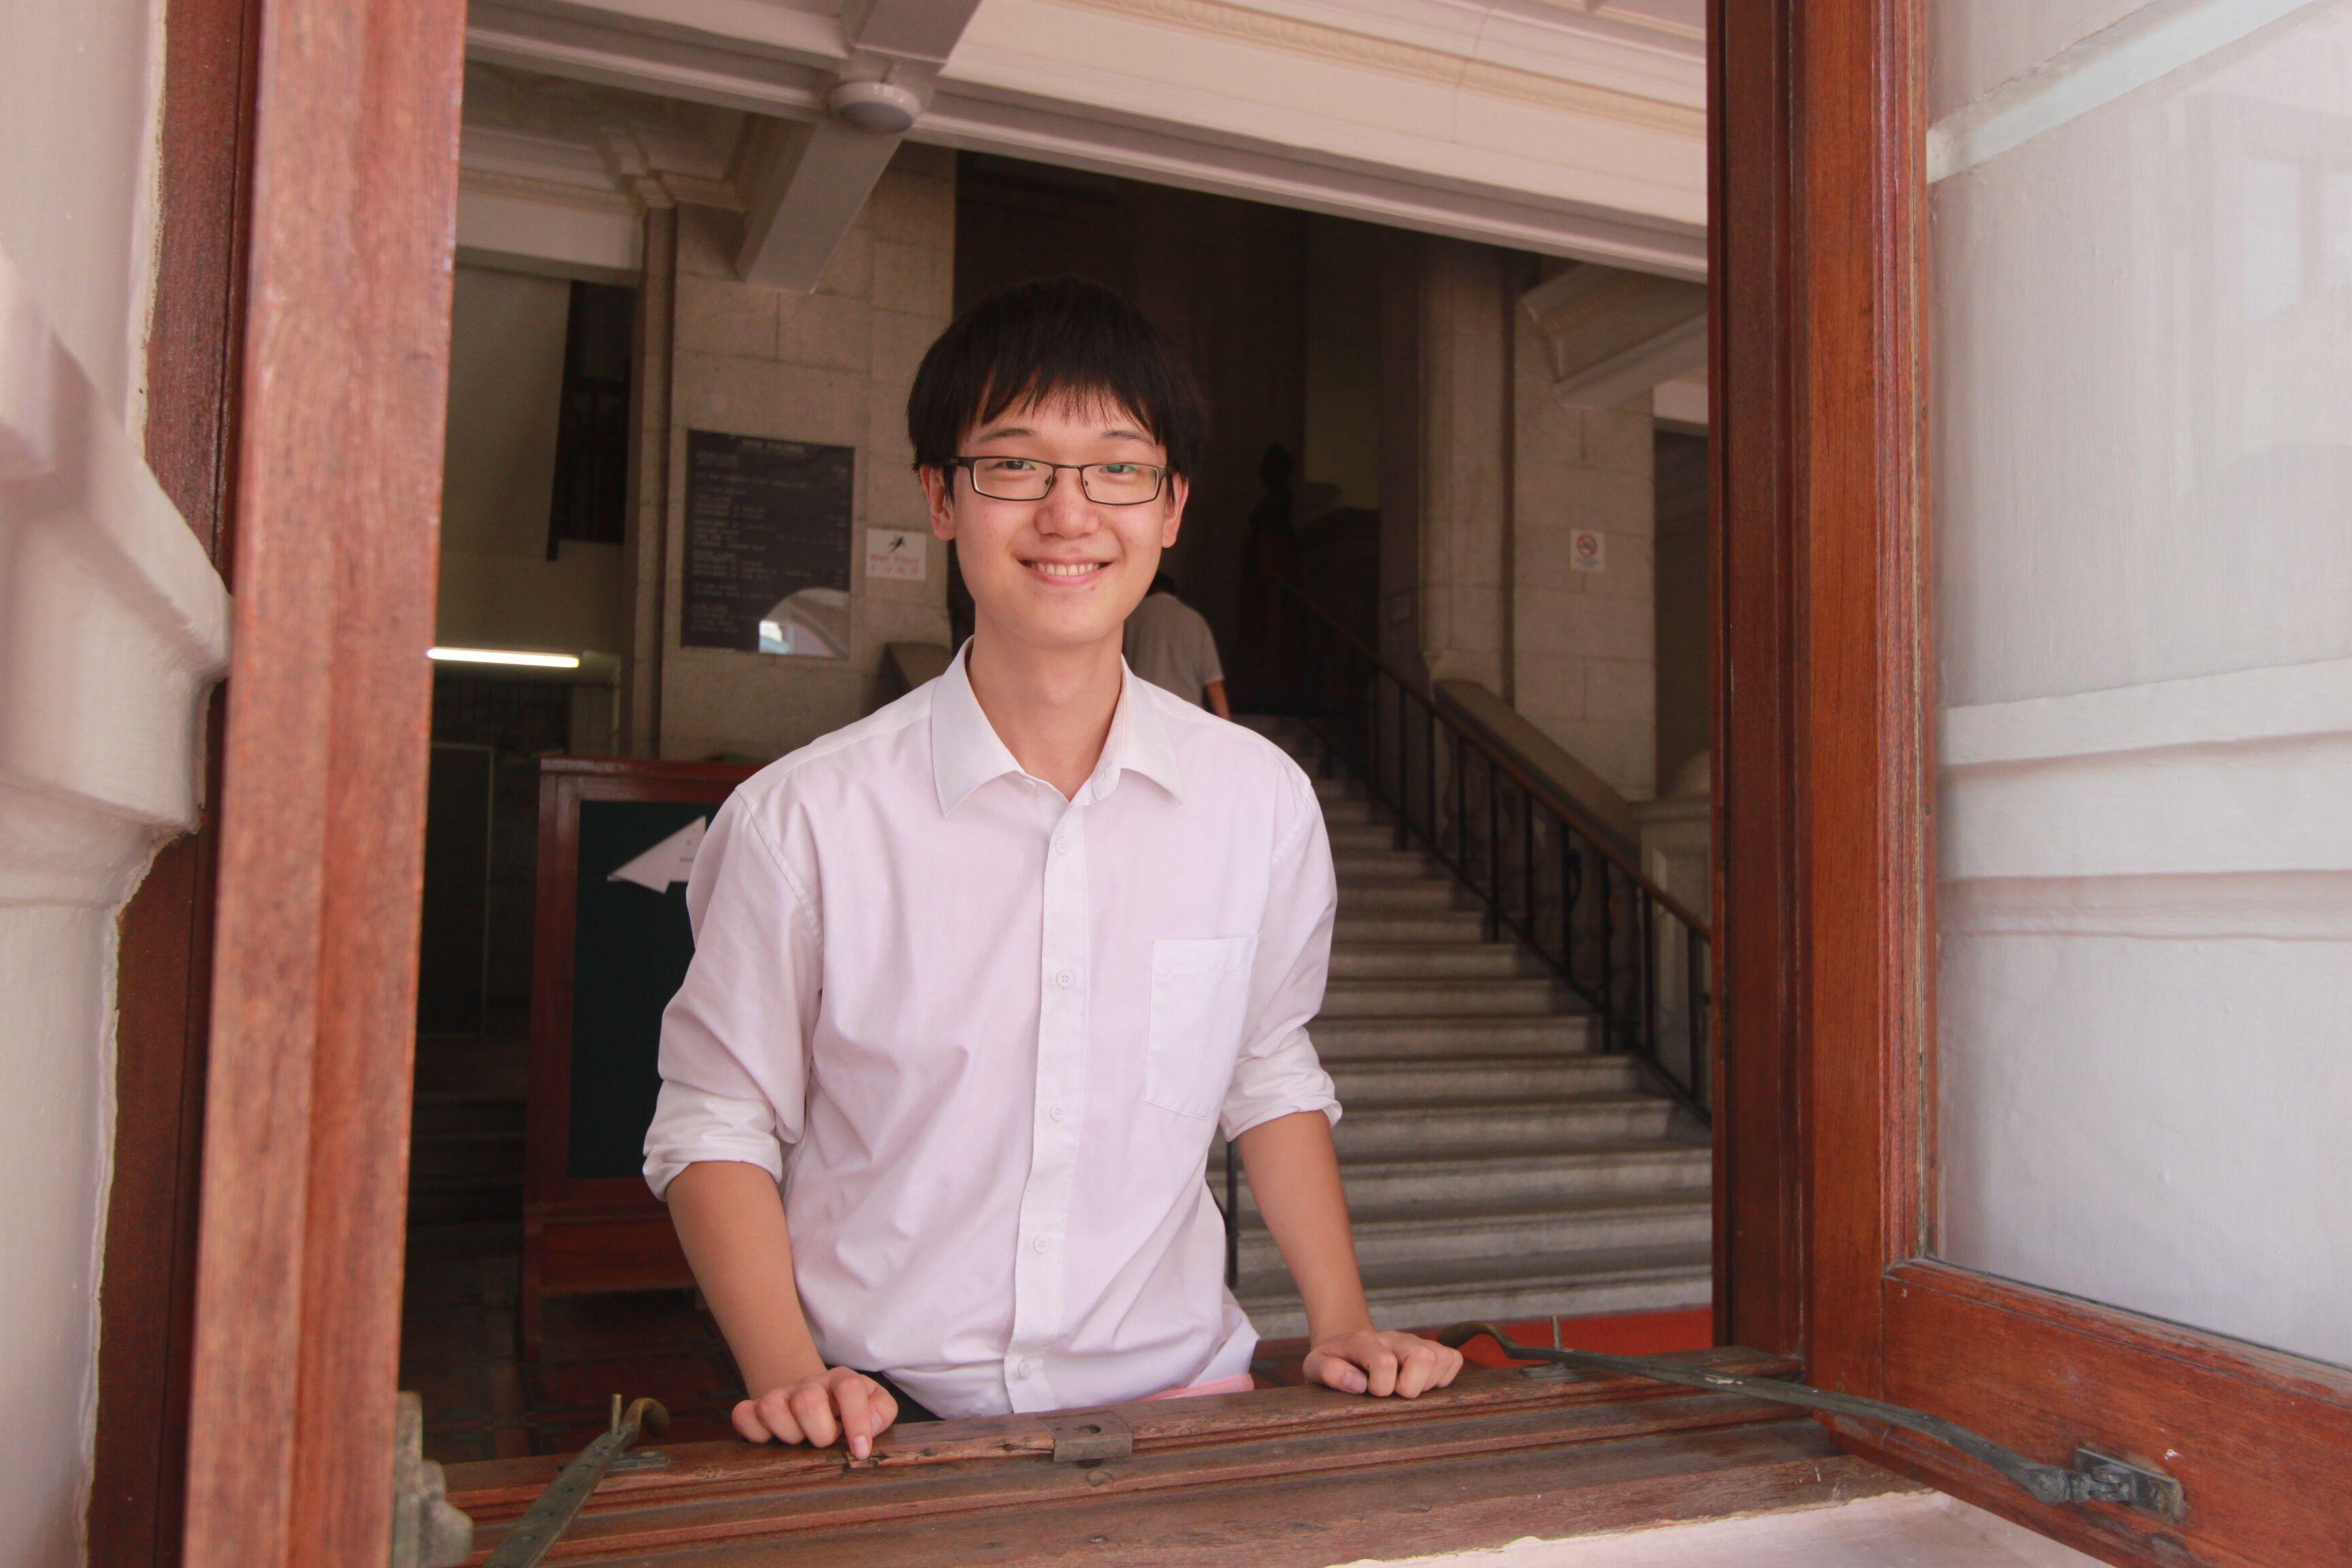 Taibo Li